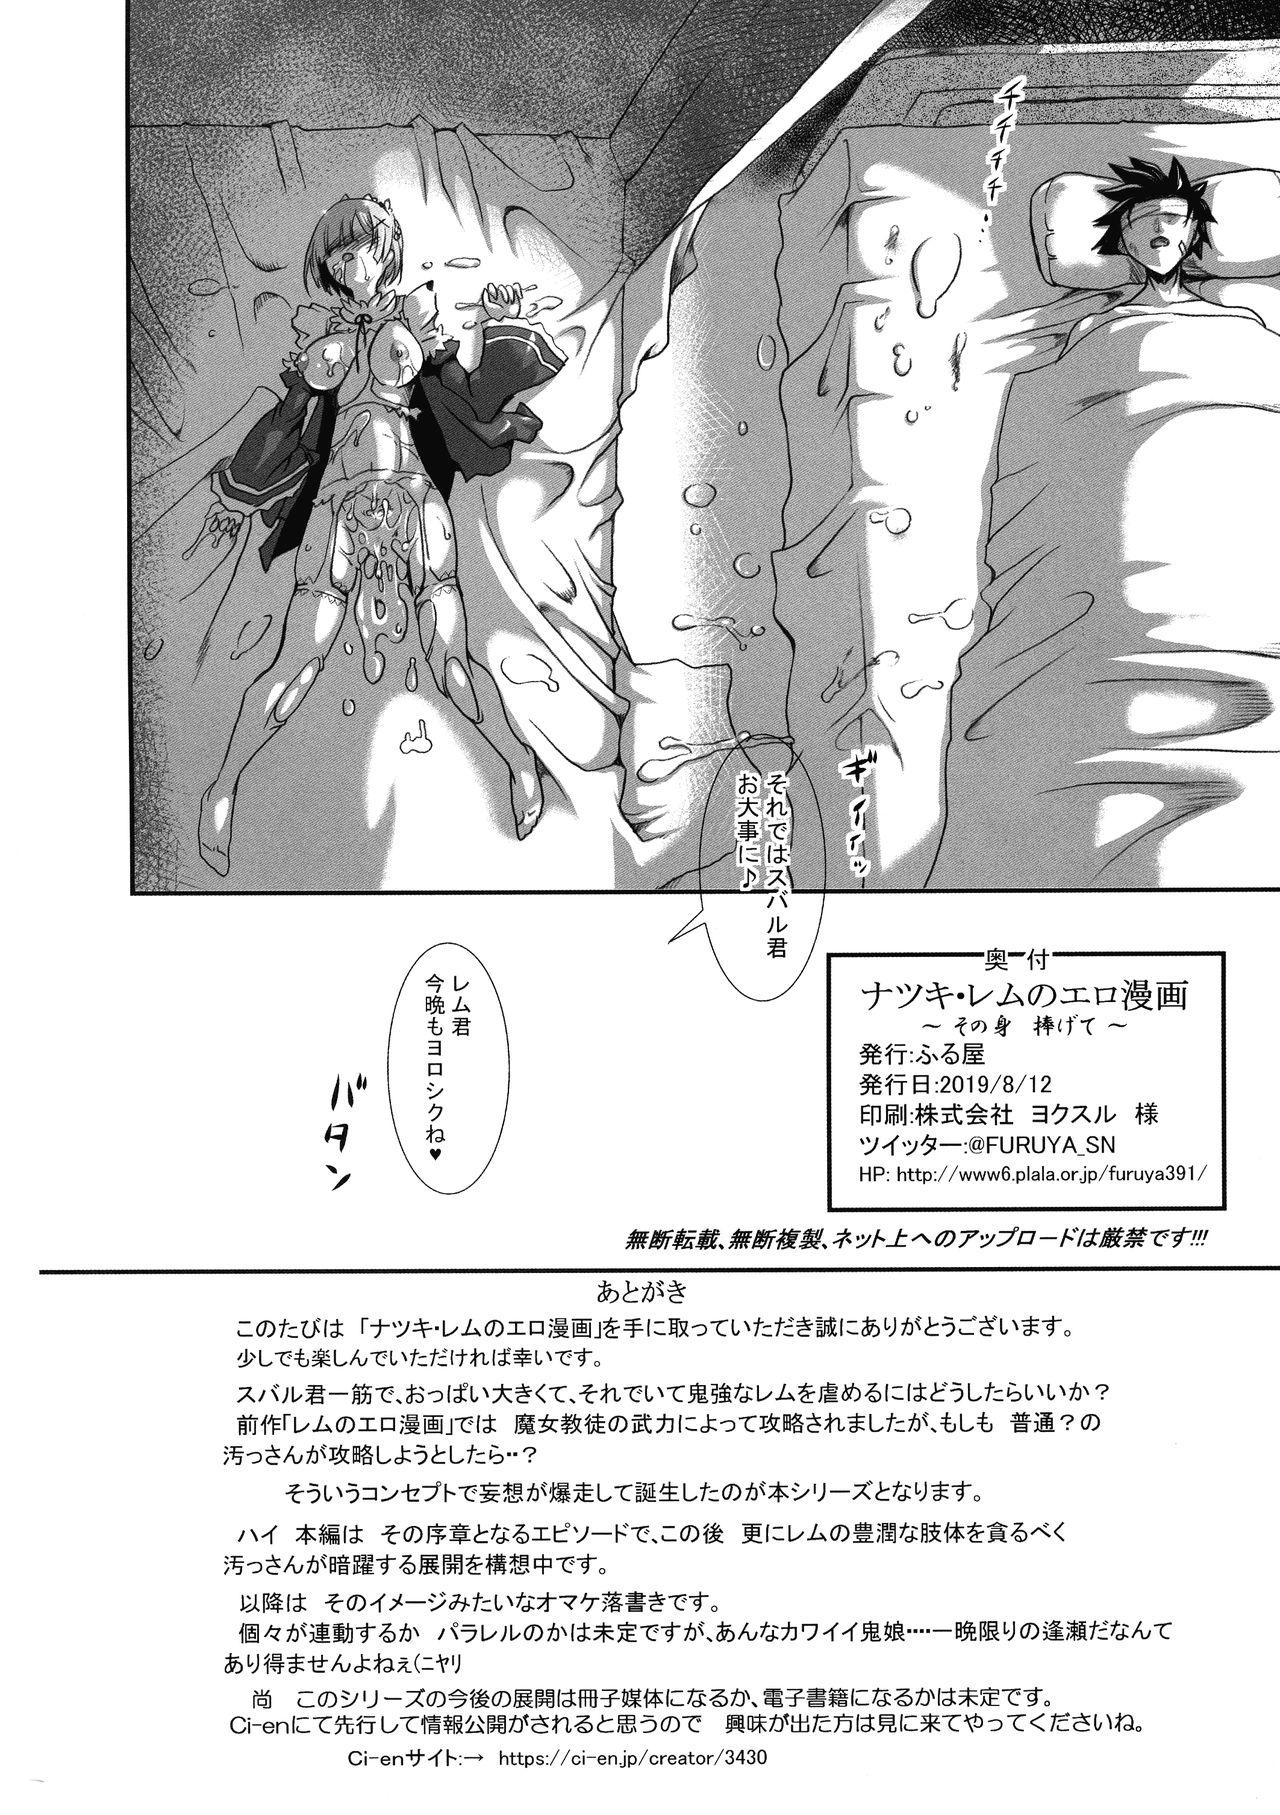 Rem:Danshou Natsuki Rem no Eromanga 29